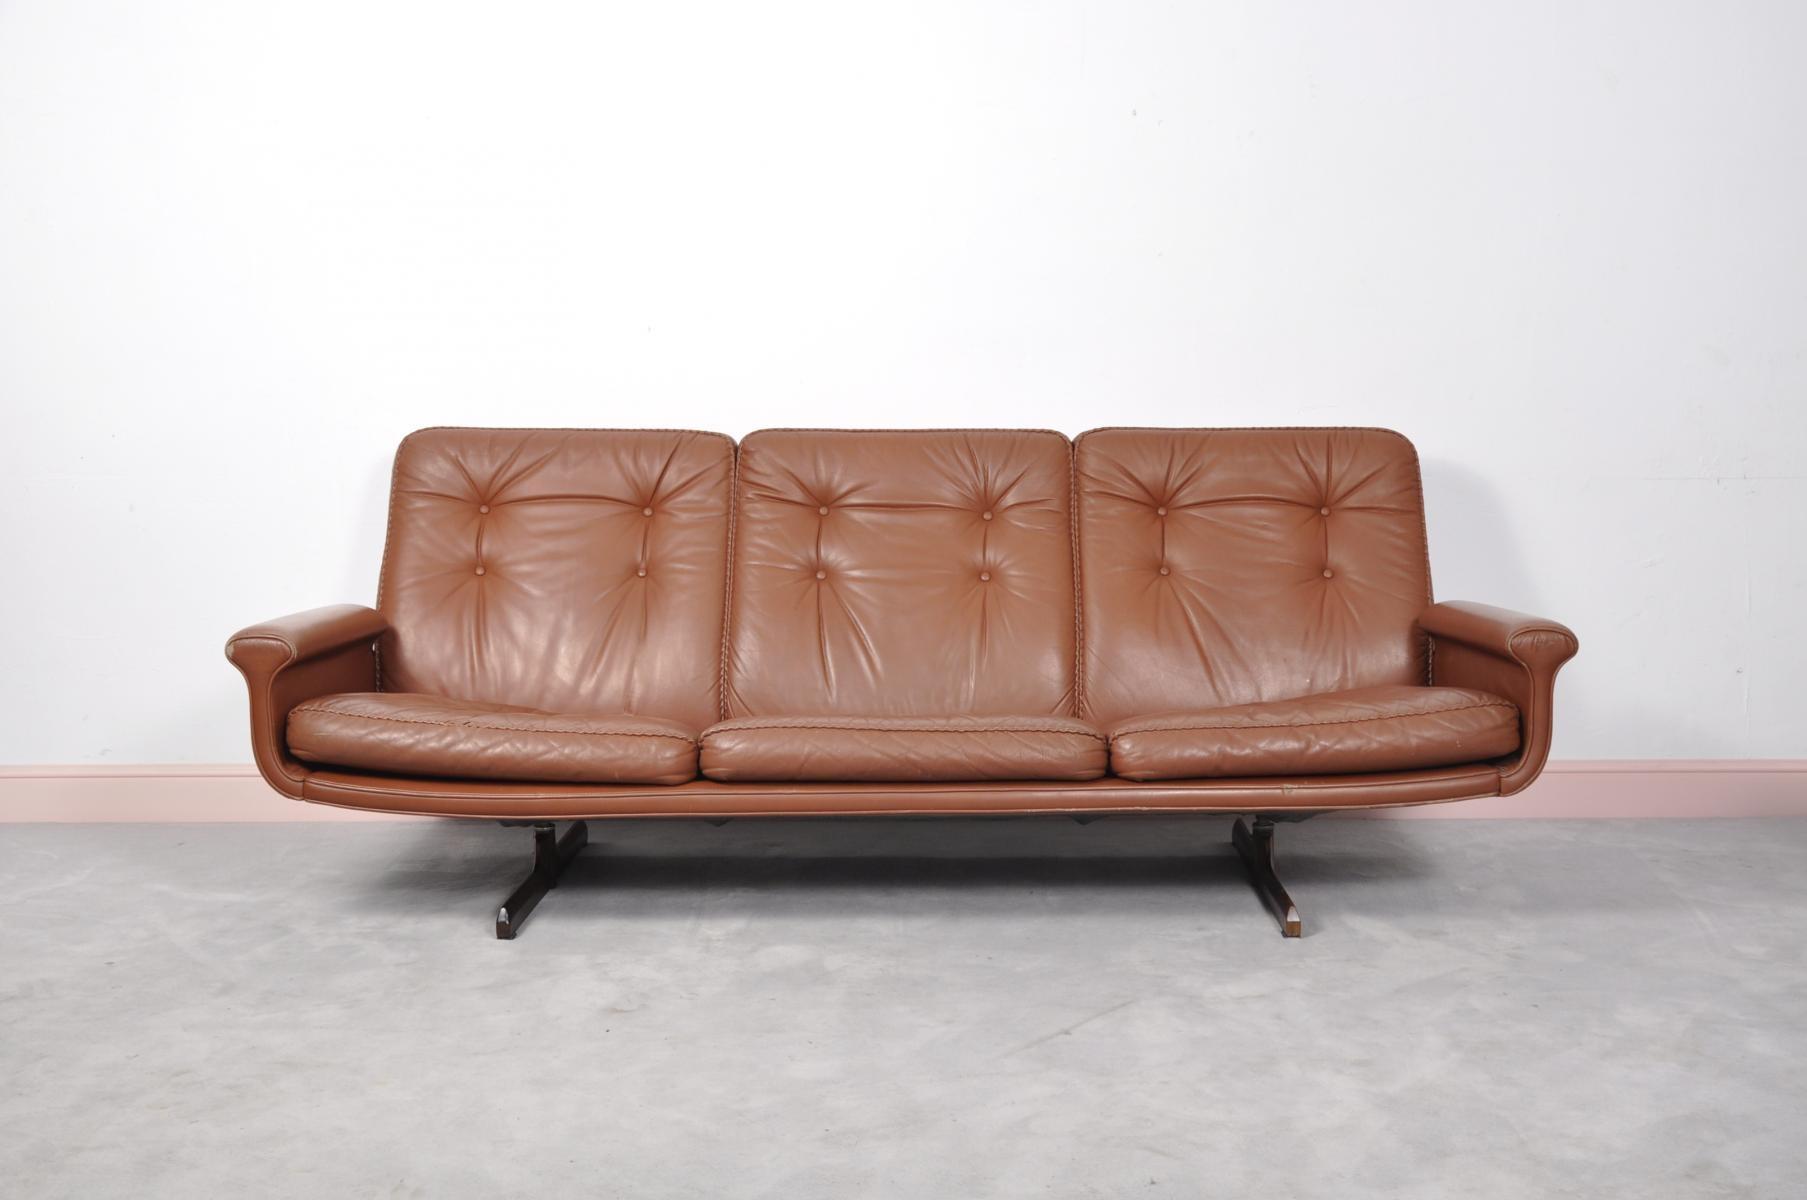 Sofas Center : Amazing Mid Century Modern Leather Sofa With Within Shaker Sofas (Image 17 of 20)